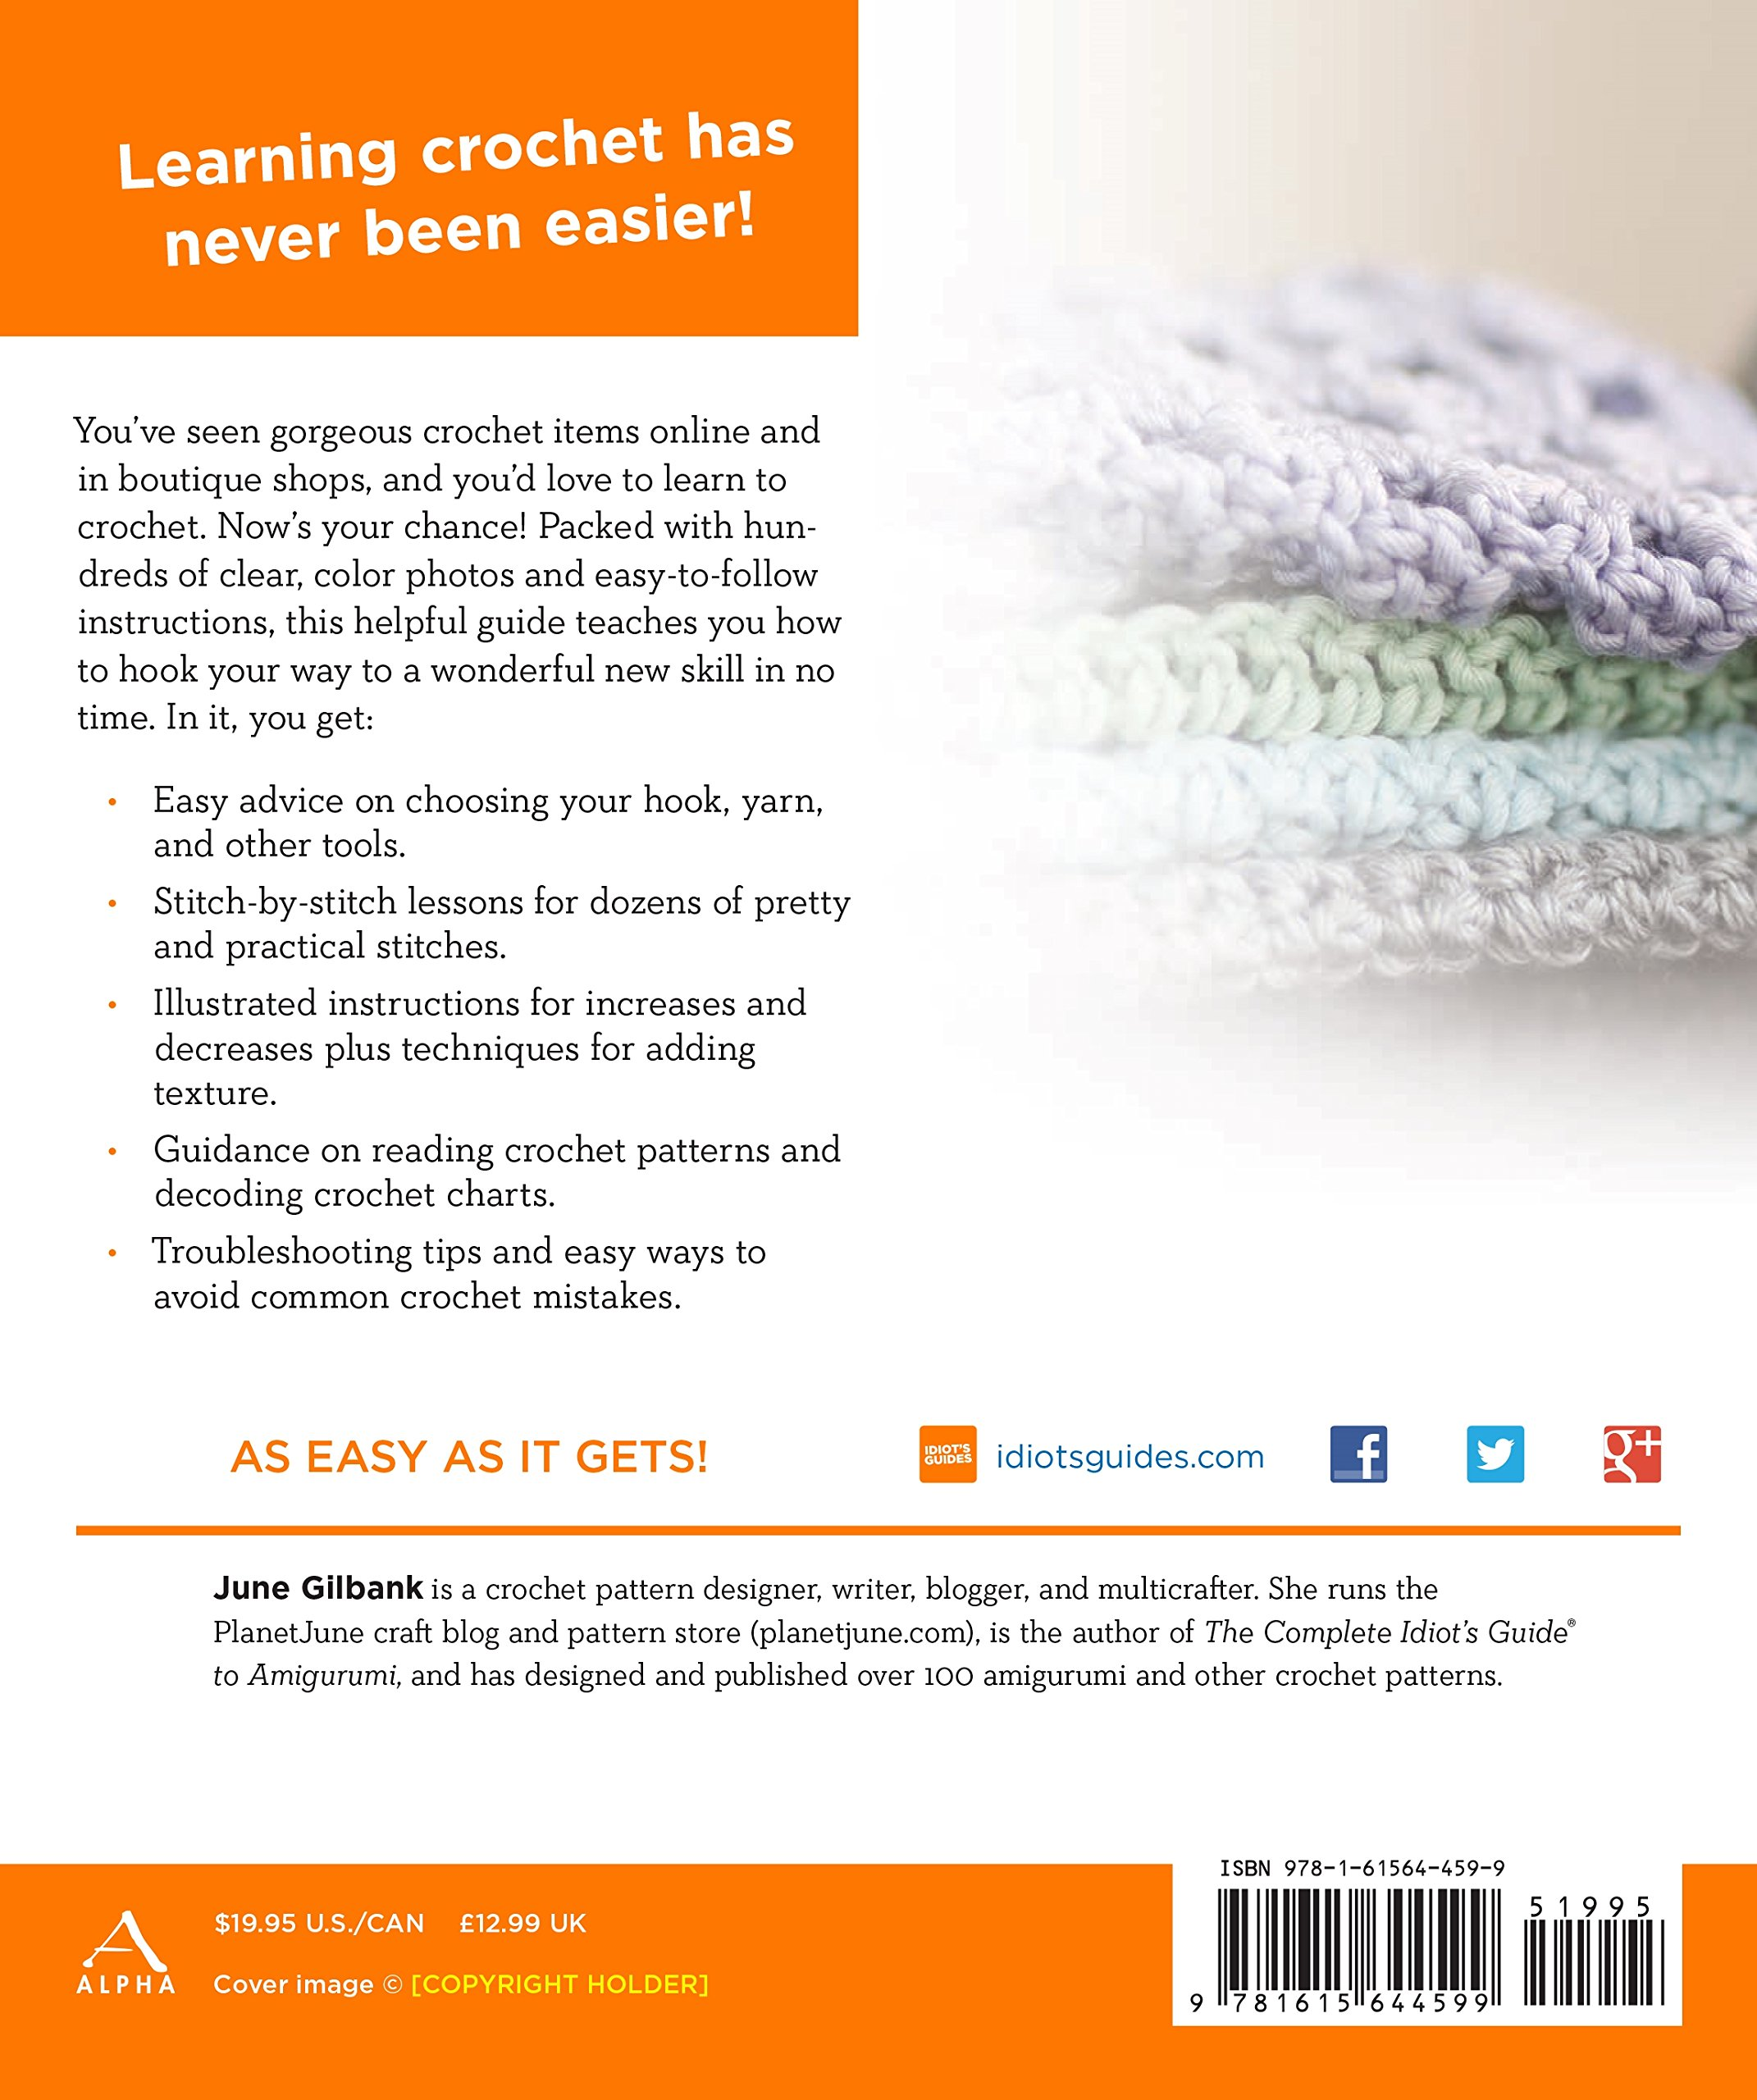 Crochet Idiots Guides June Gilbank 9781615644599 Amazon Books